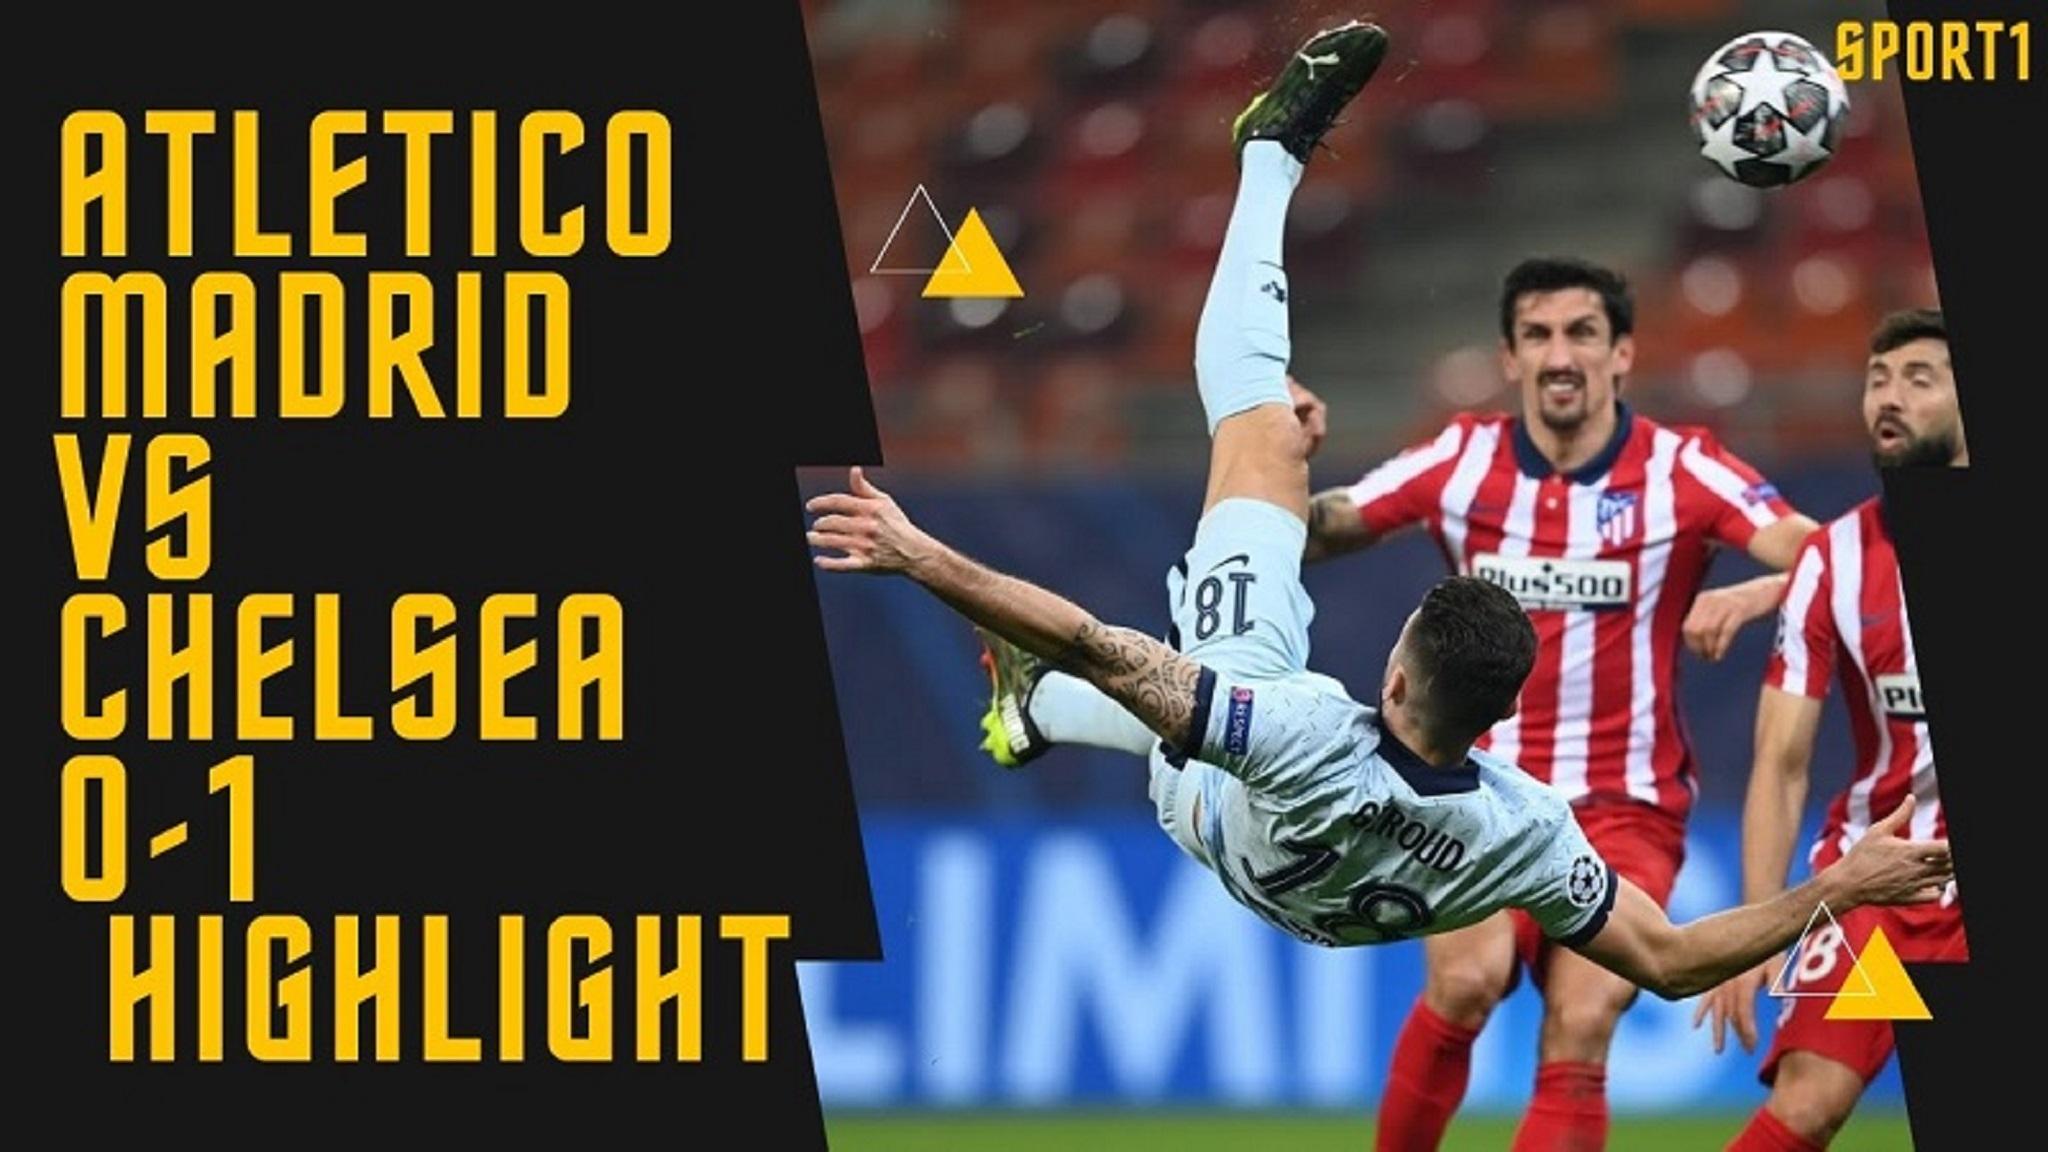 Highlights Atletico Madrid vs Chelsea | UCL 24 Feb 2021